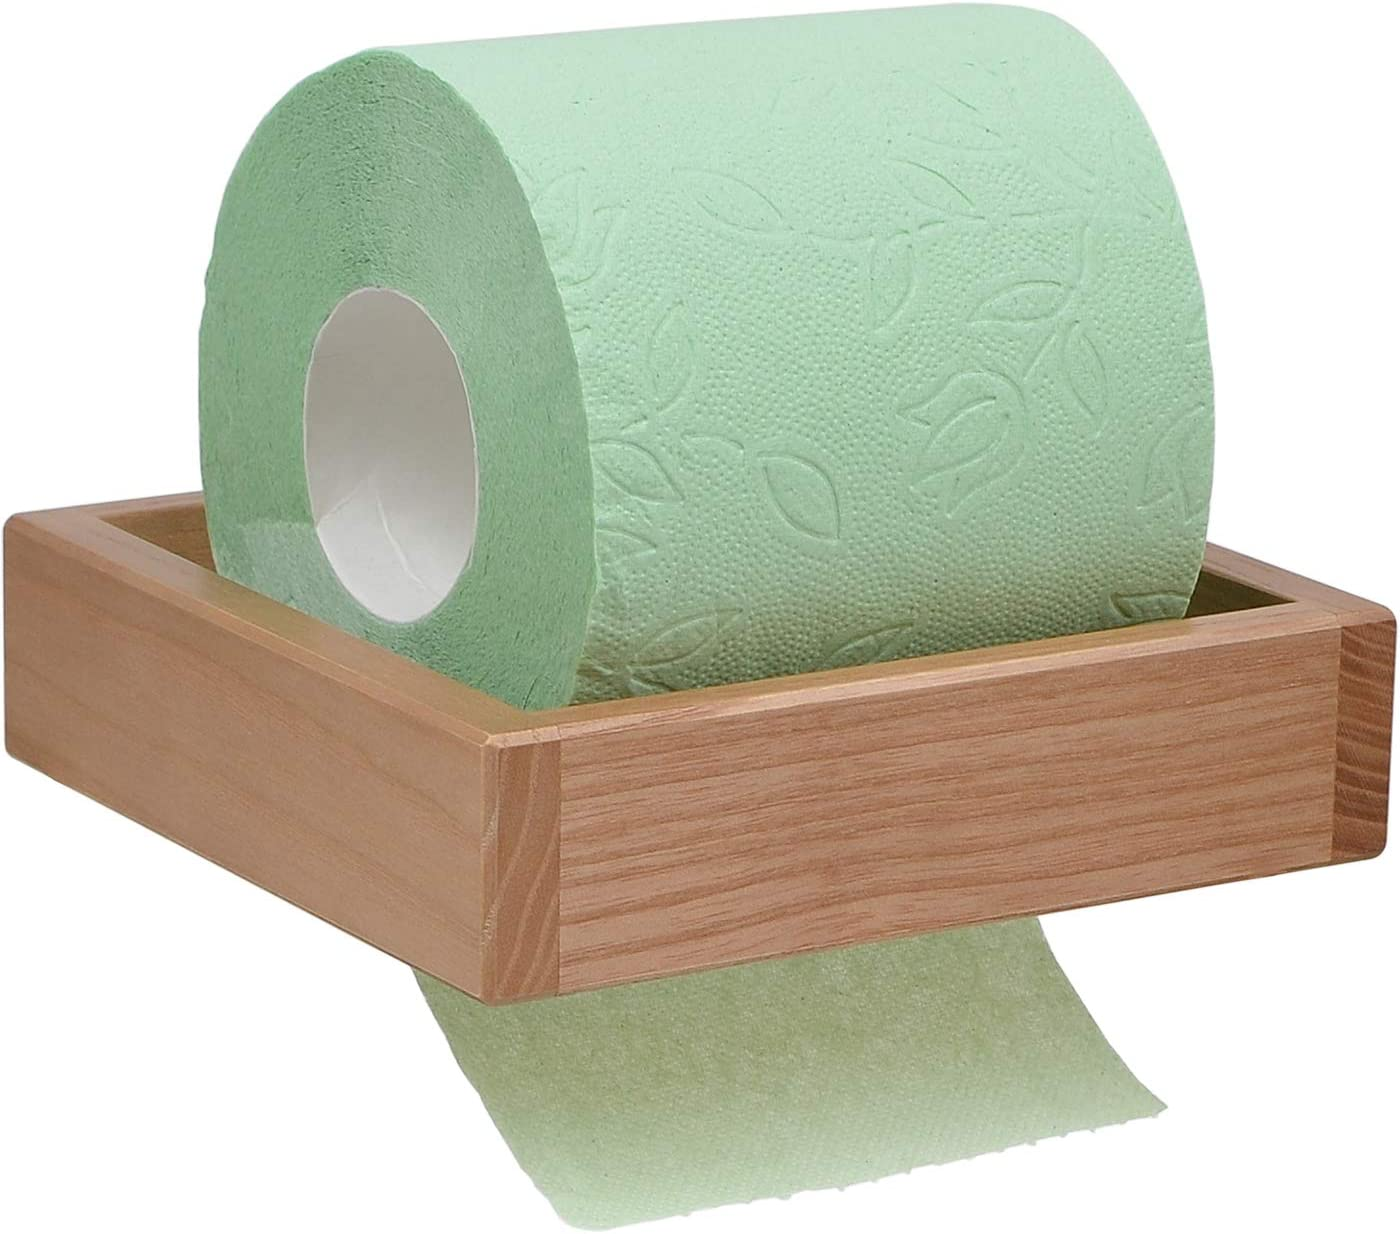 Wood Toilet Paper Holder Amazon Co Uk Kitchen Home